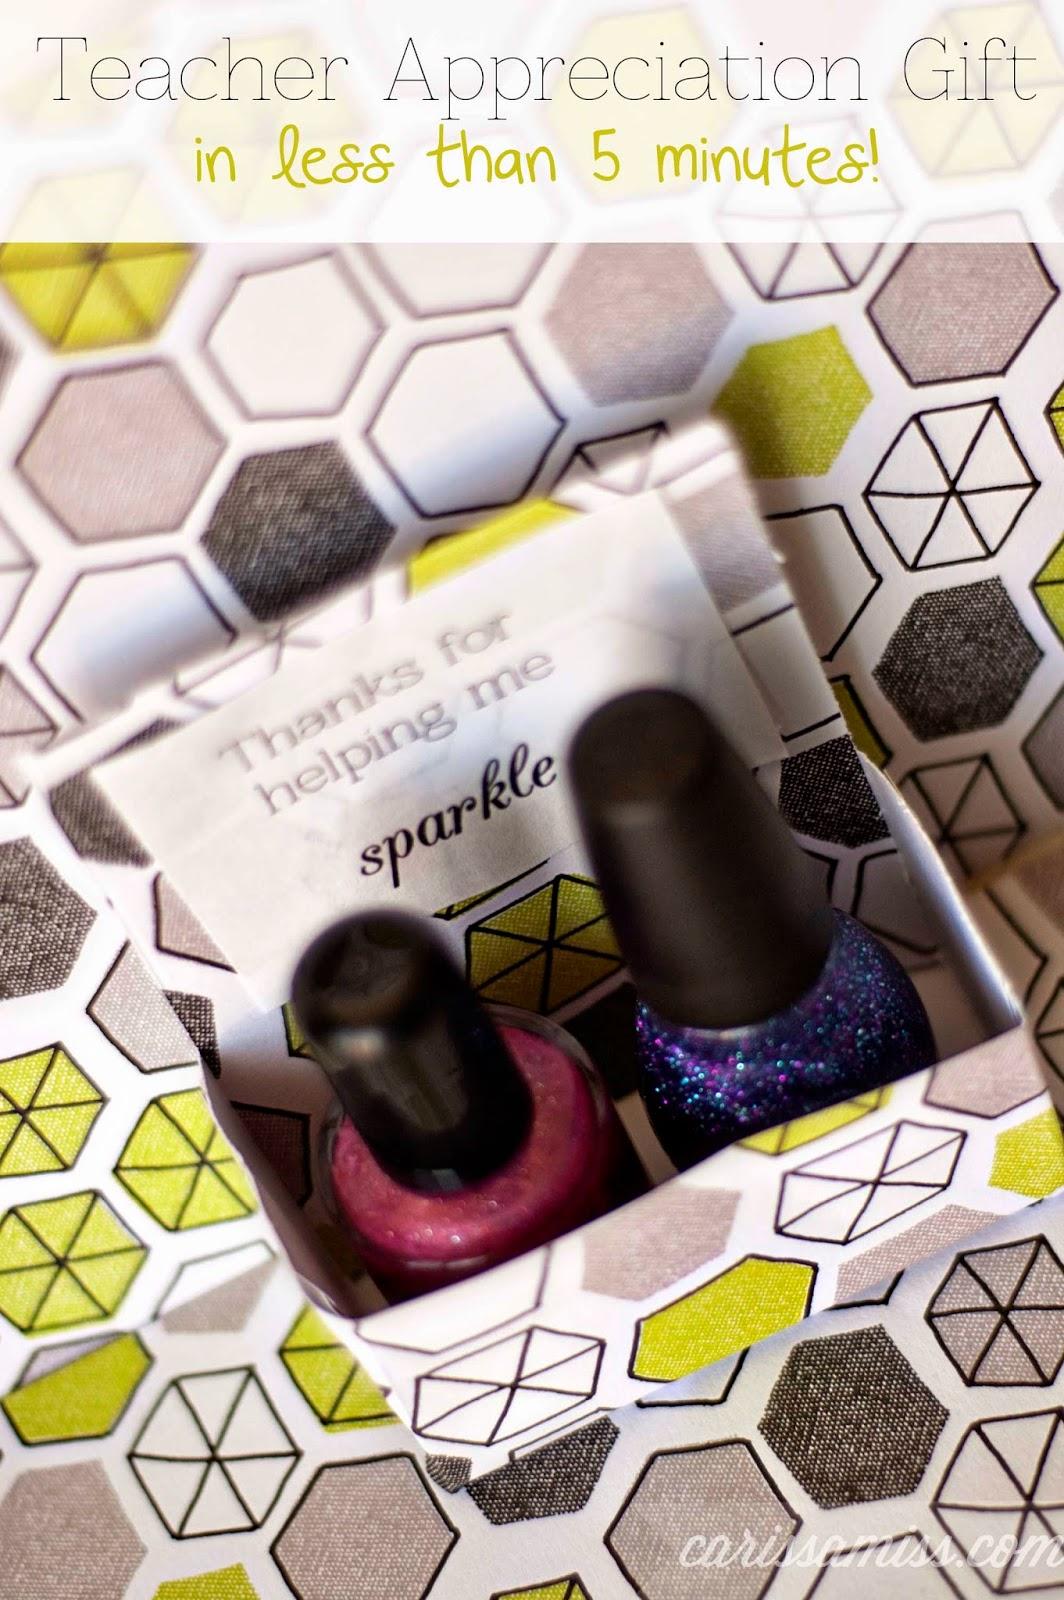 tacl5 nail polish gift box DSC_0402